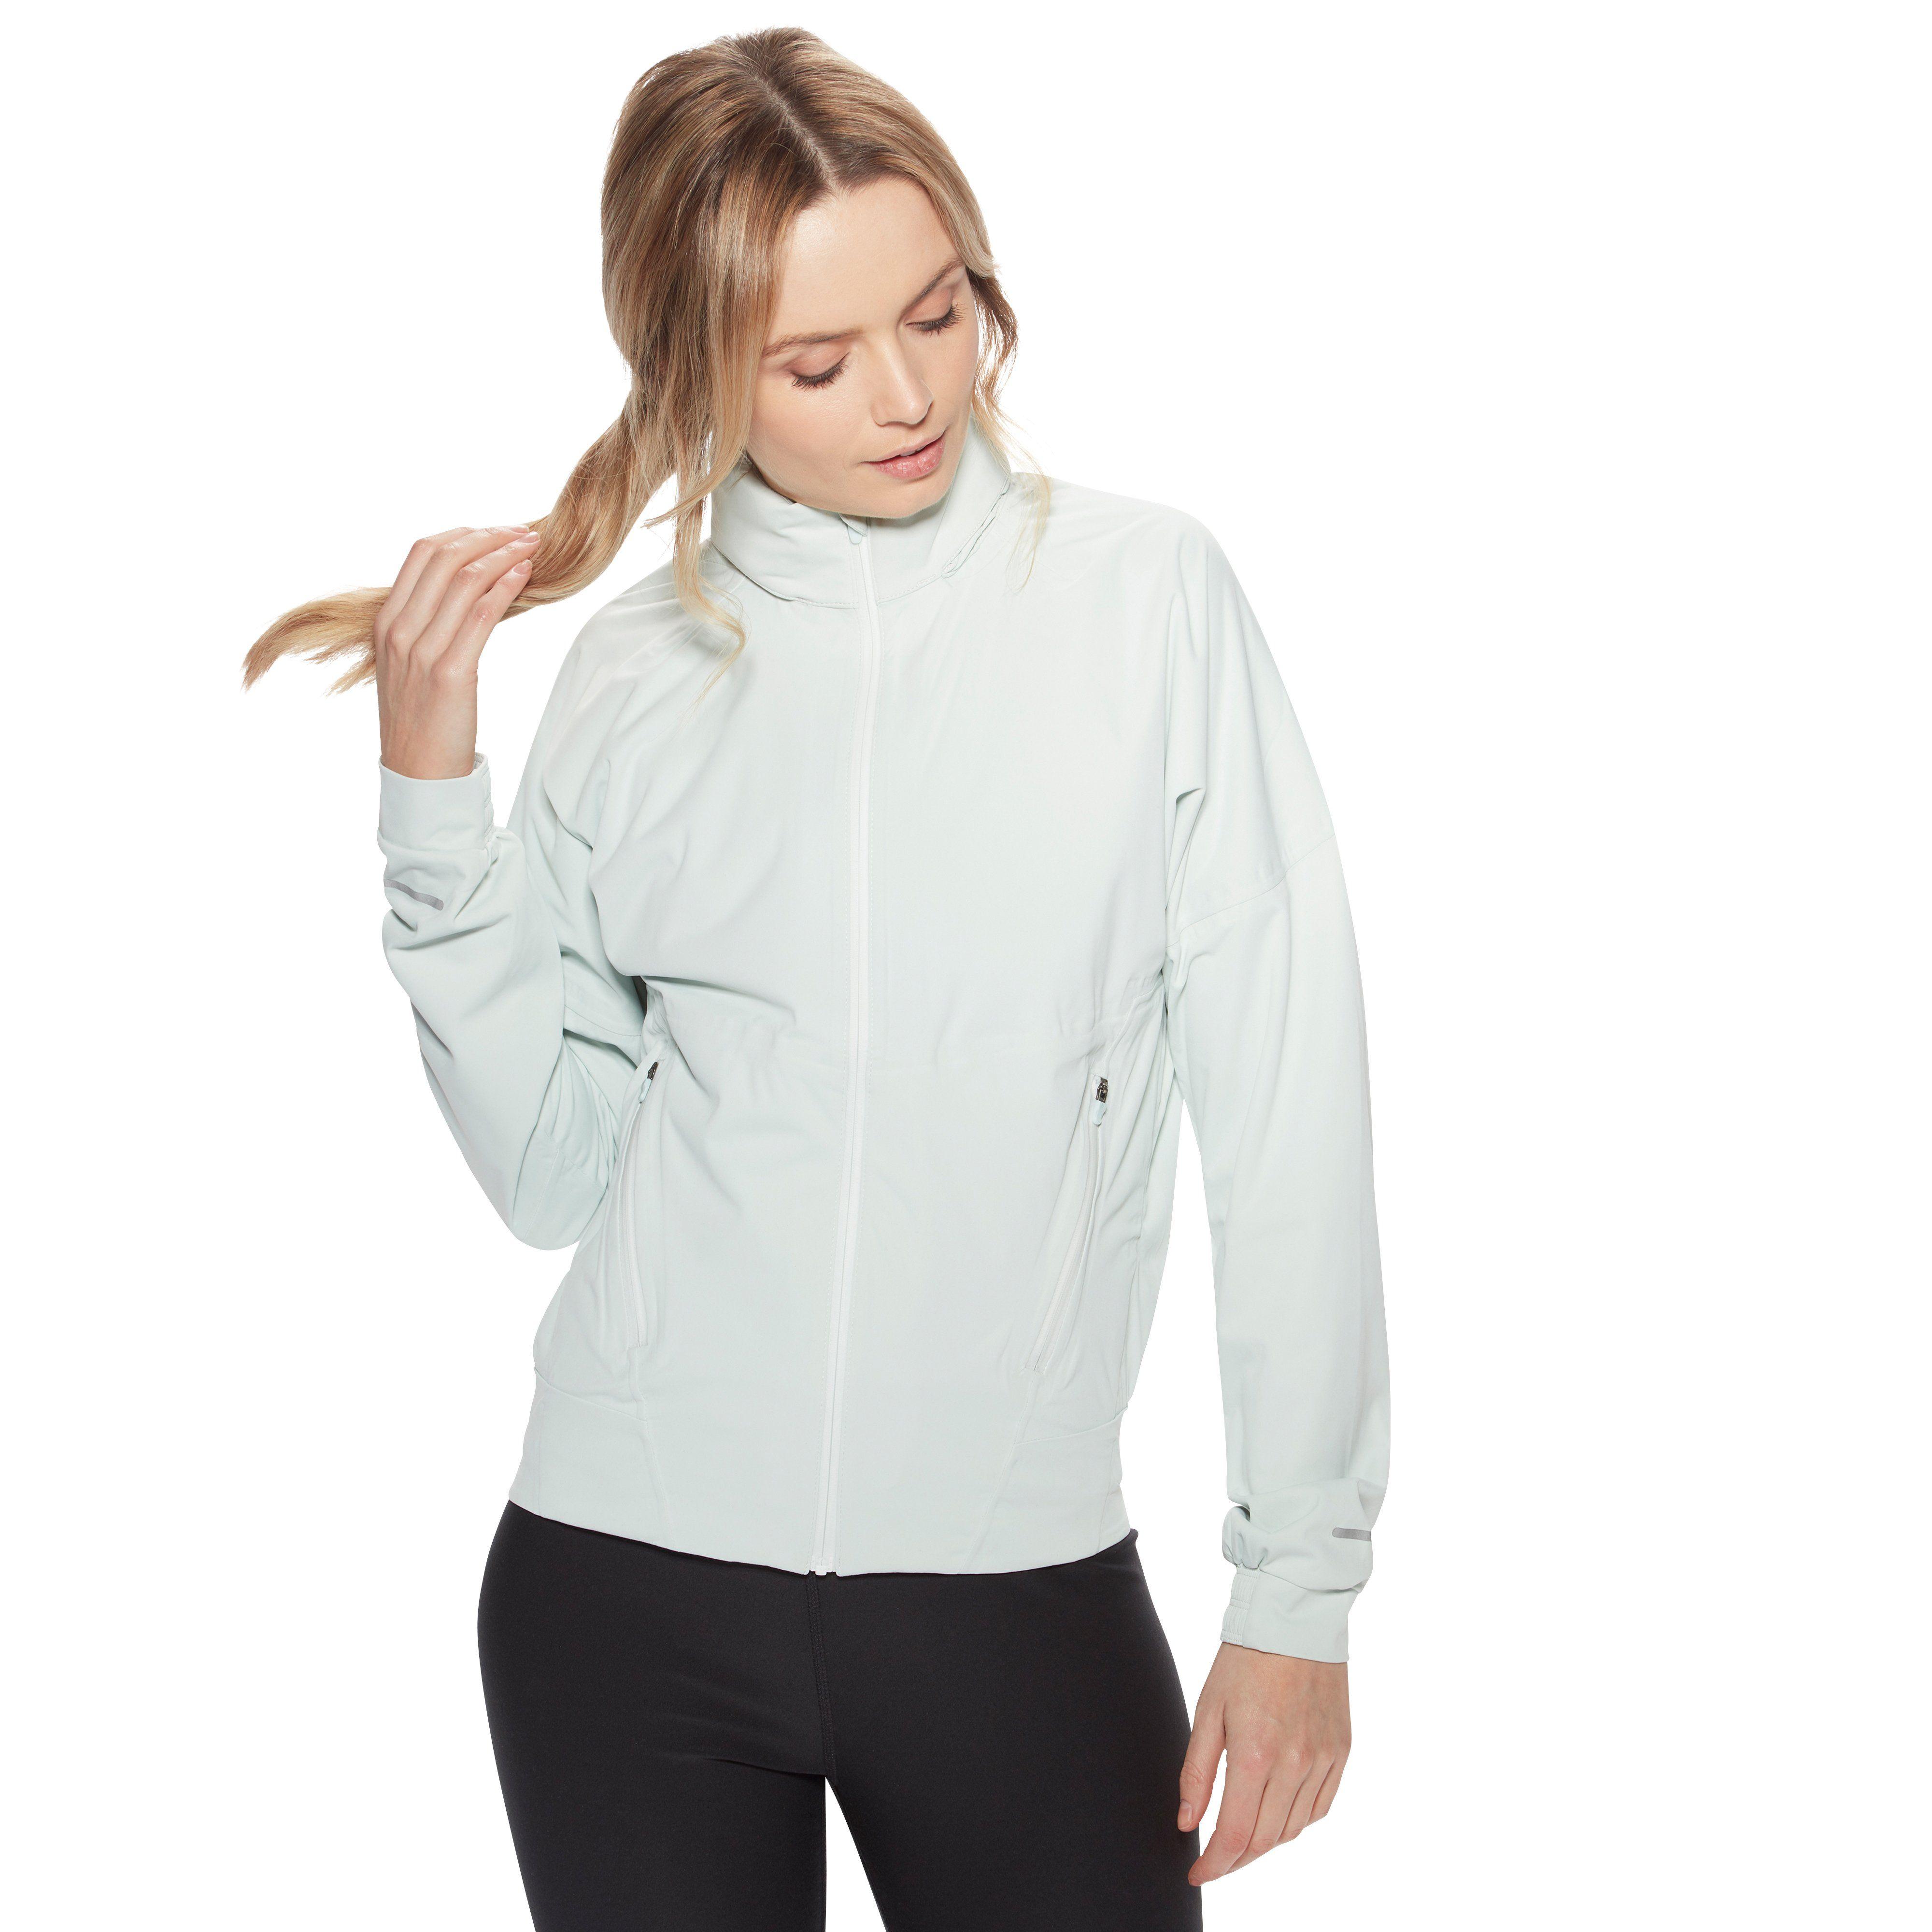 ASICS Accelerate Women's Running Jacket